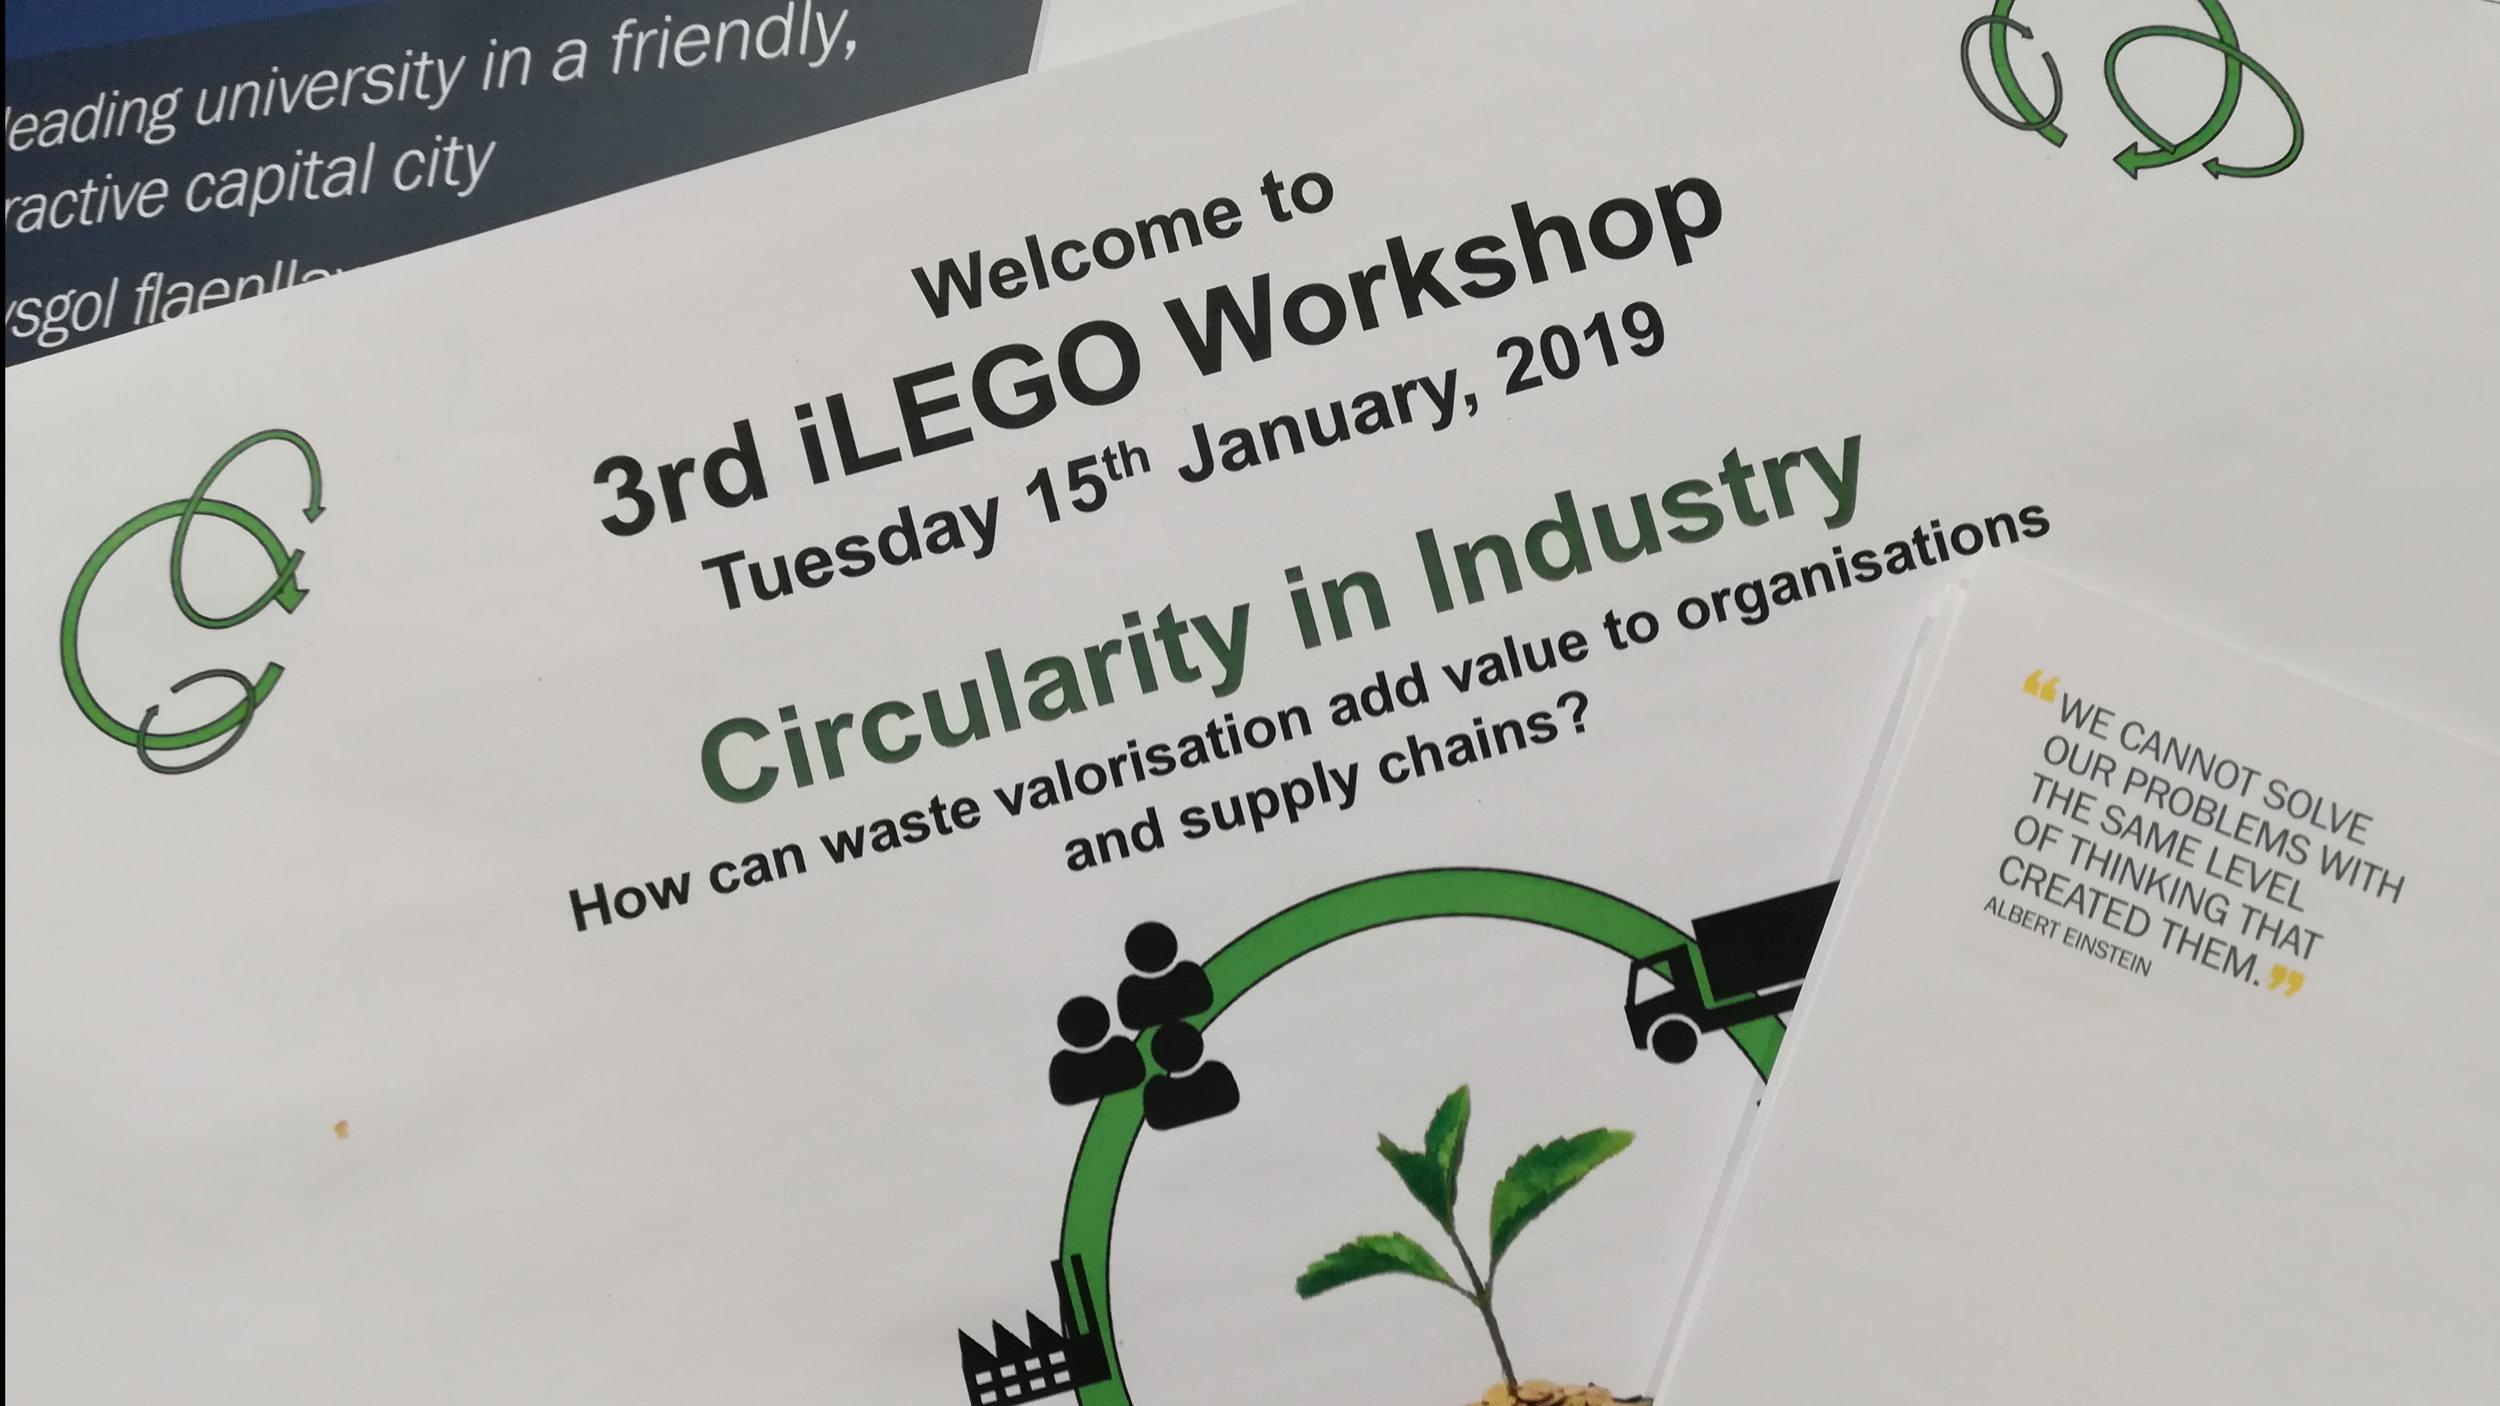 3rd iLego Workshop hosted by Cardiff Business School